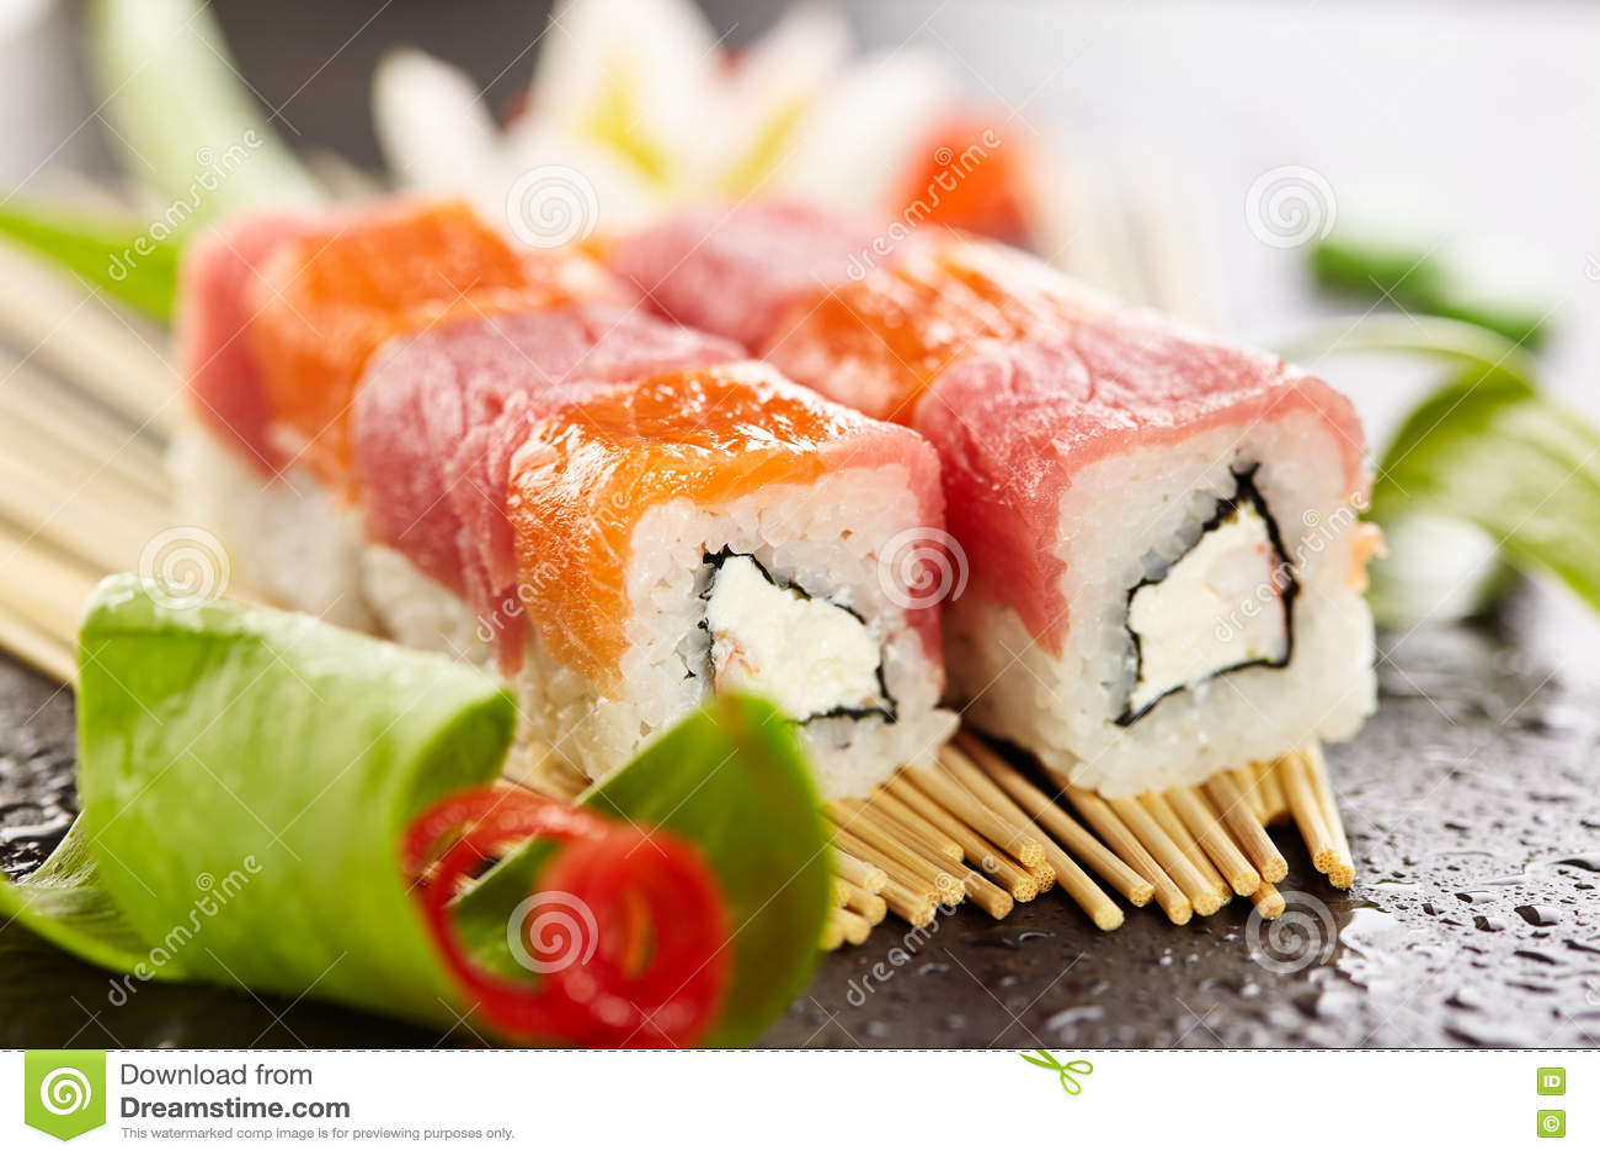 Salmon And Tuna Sushi Roll Stock Image Image Of Fish